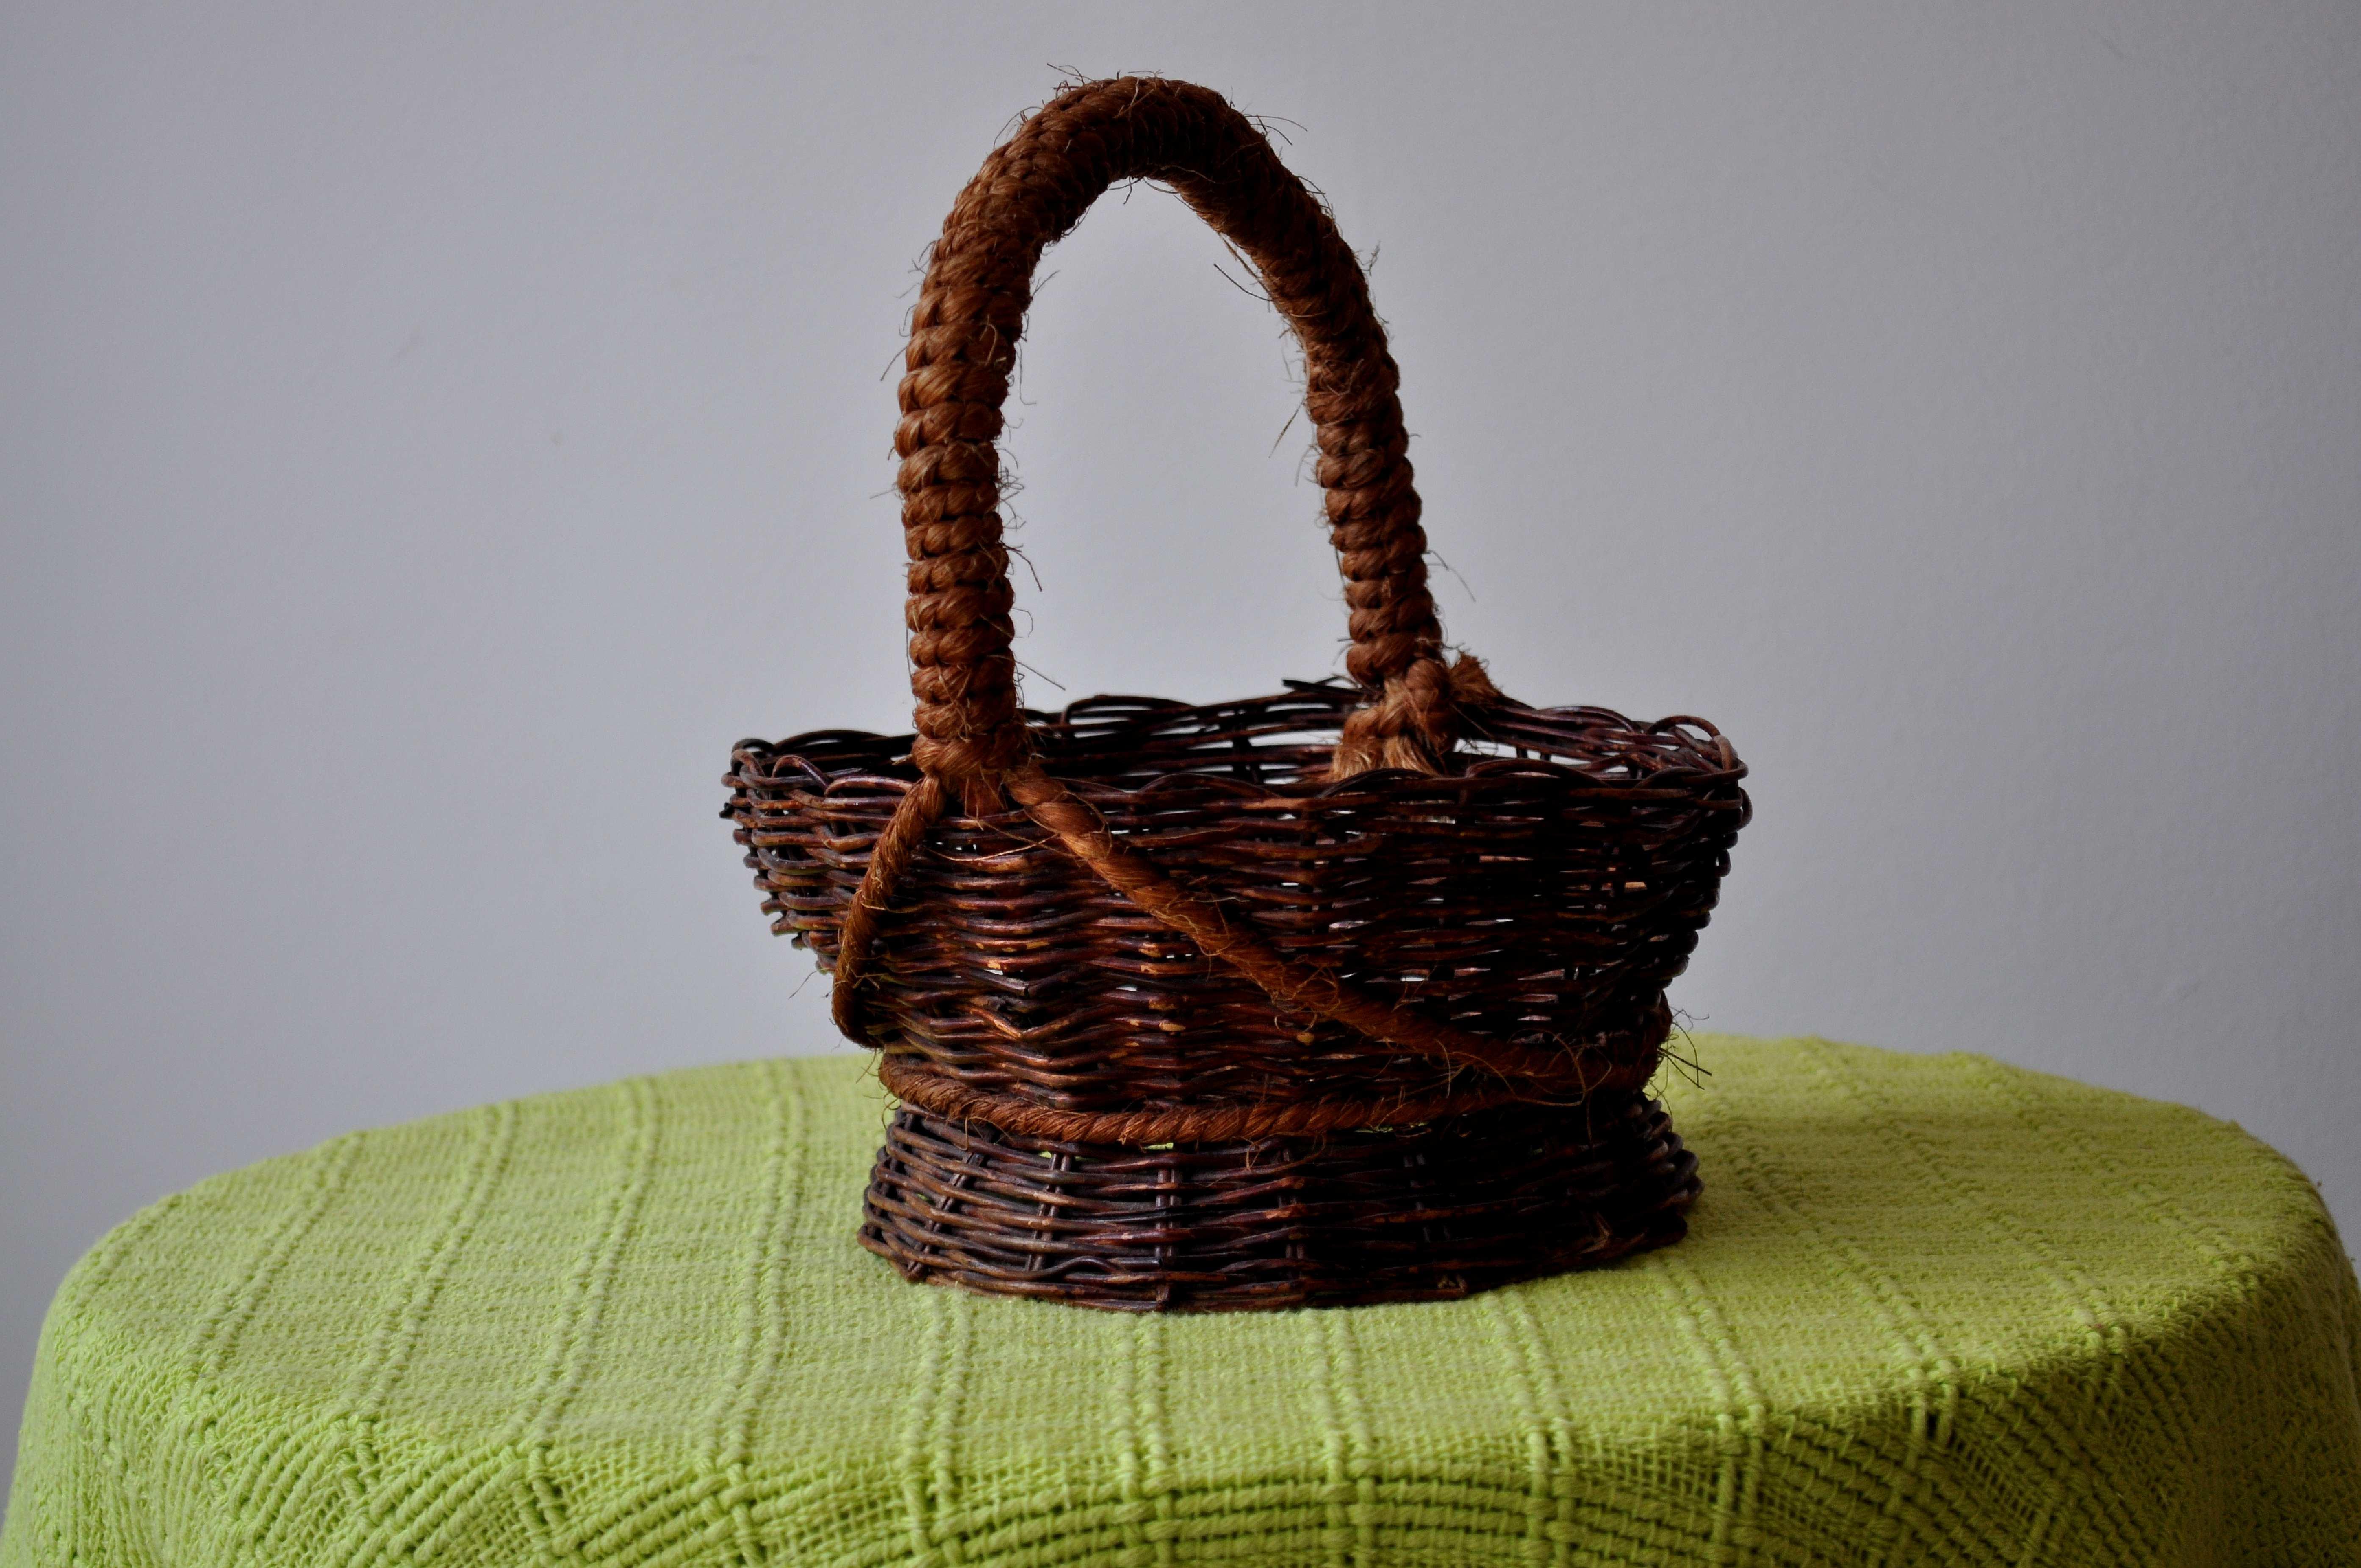 Free photograph; decorative, baskets, woven, wicker, handicrafts